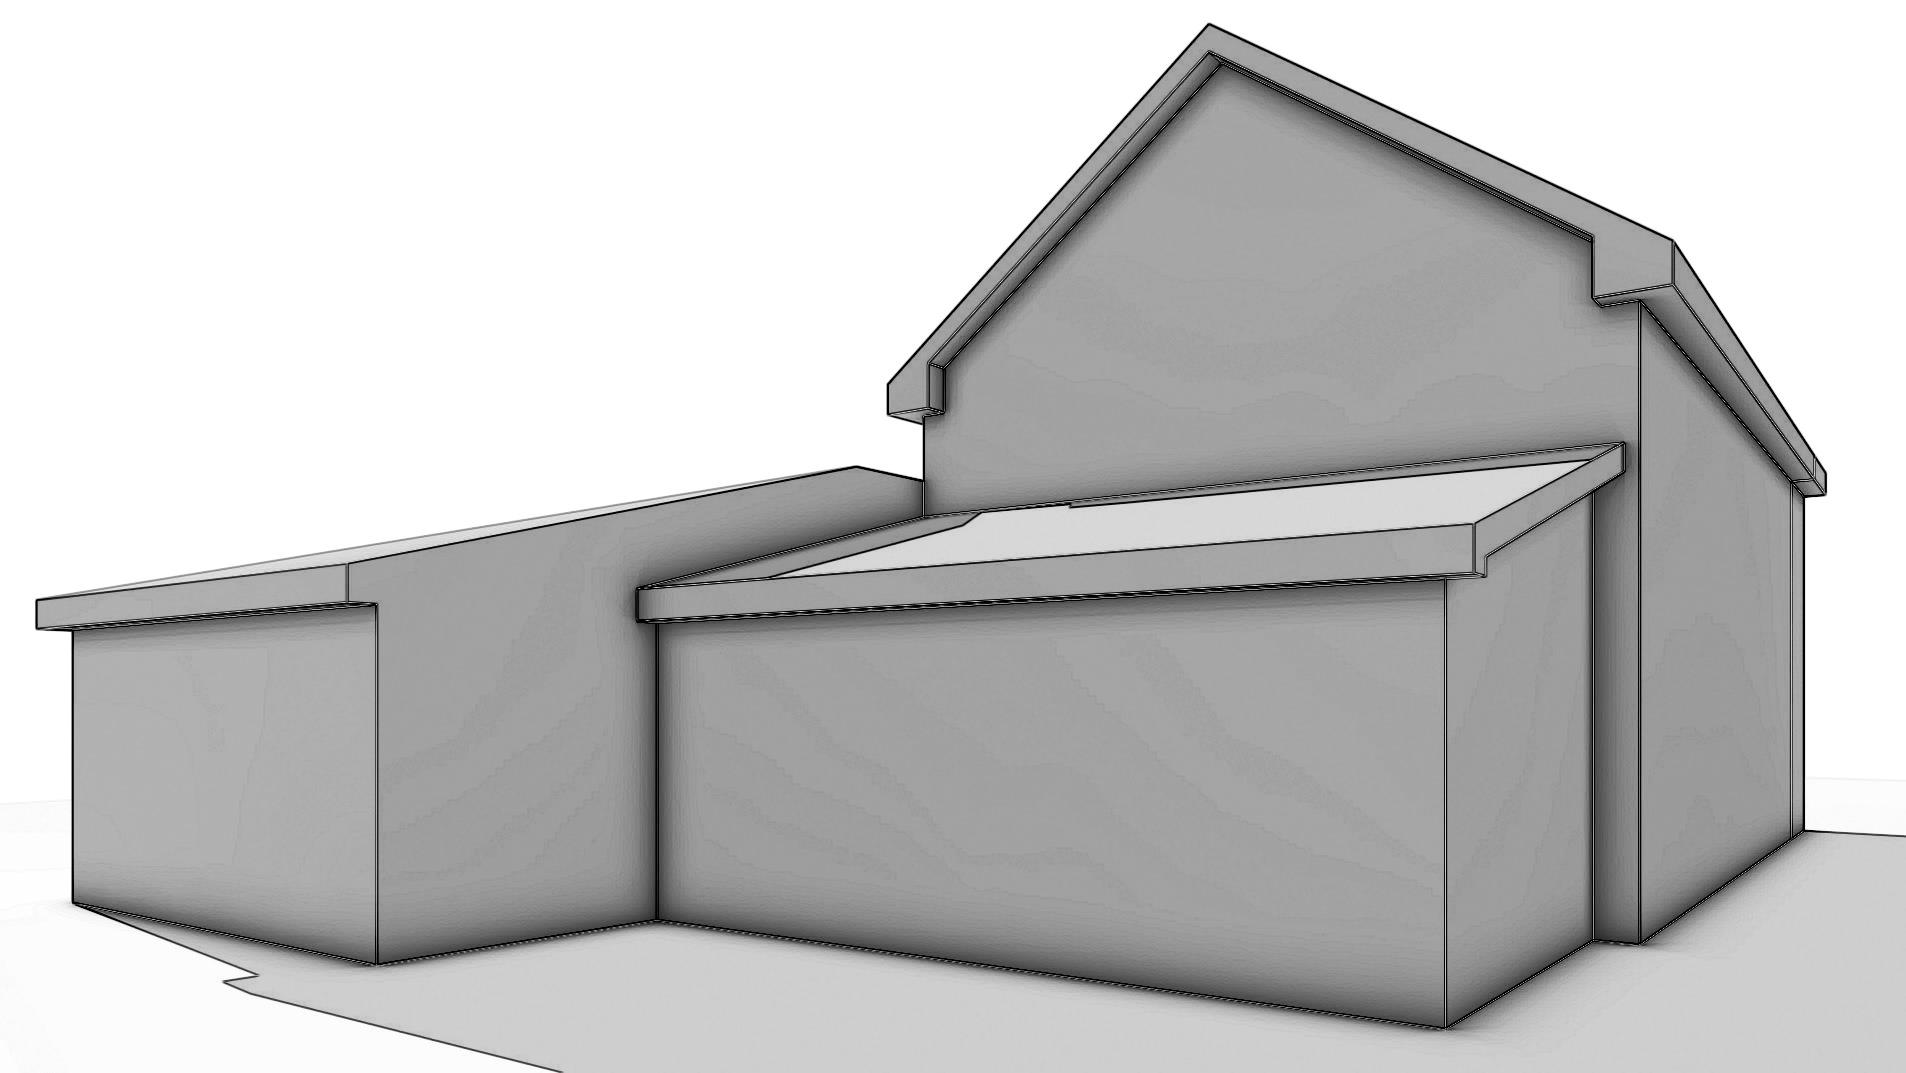 Roofline3-d.jpg